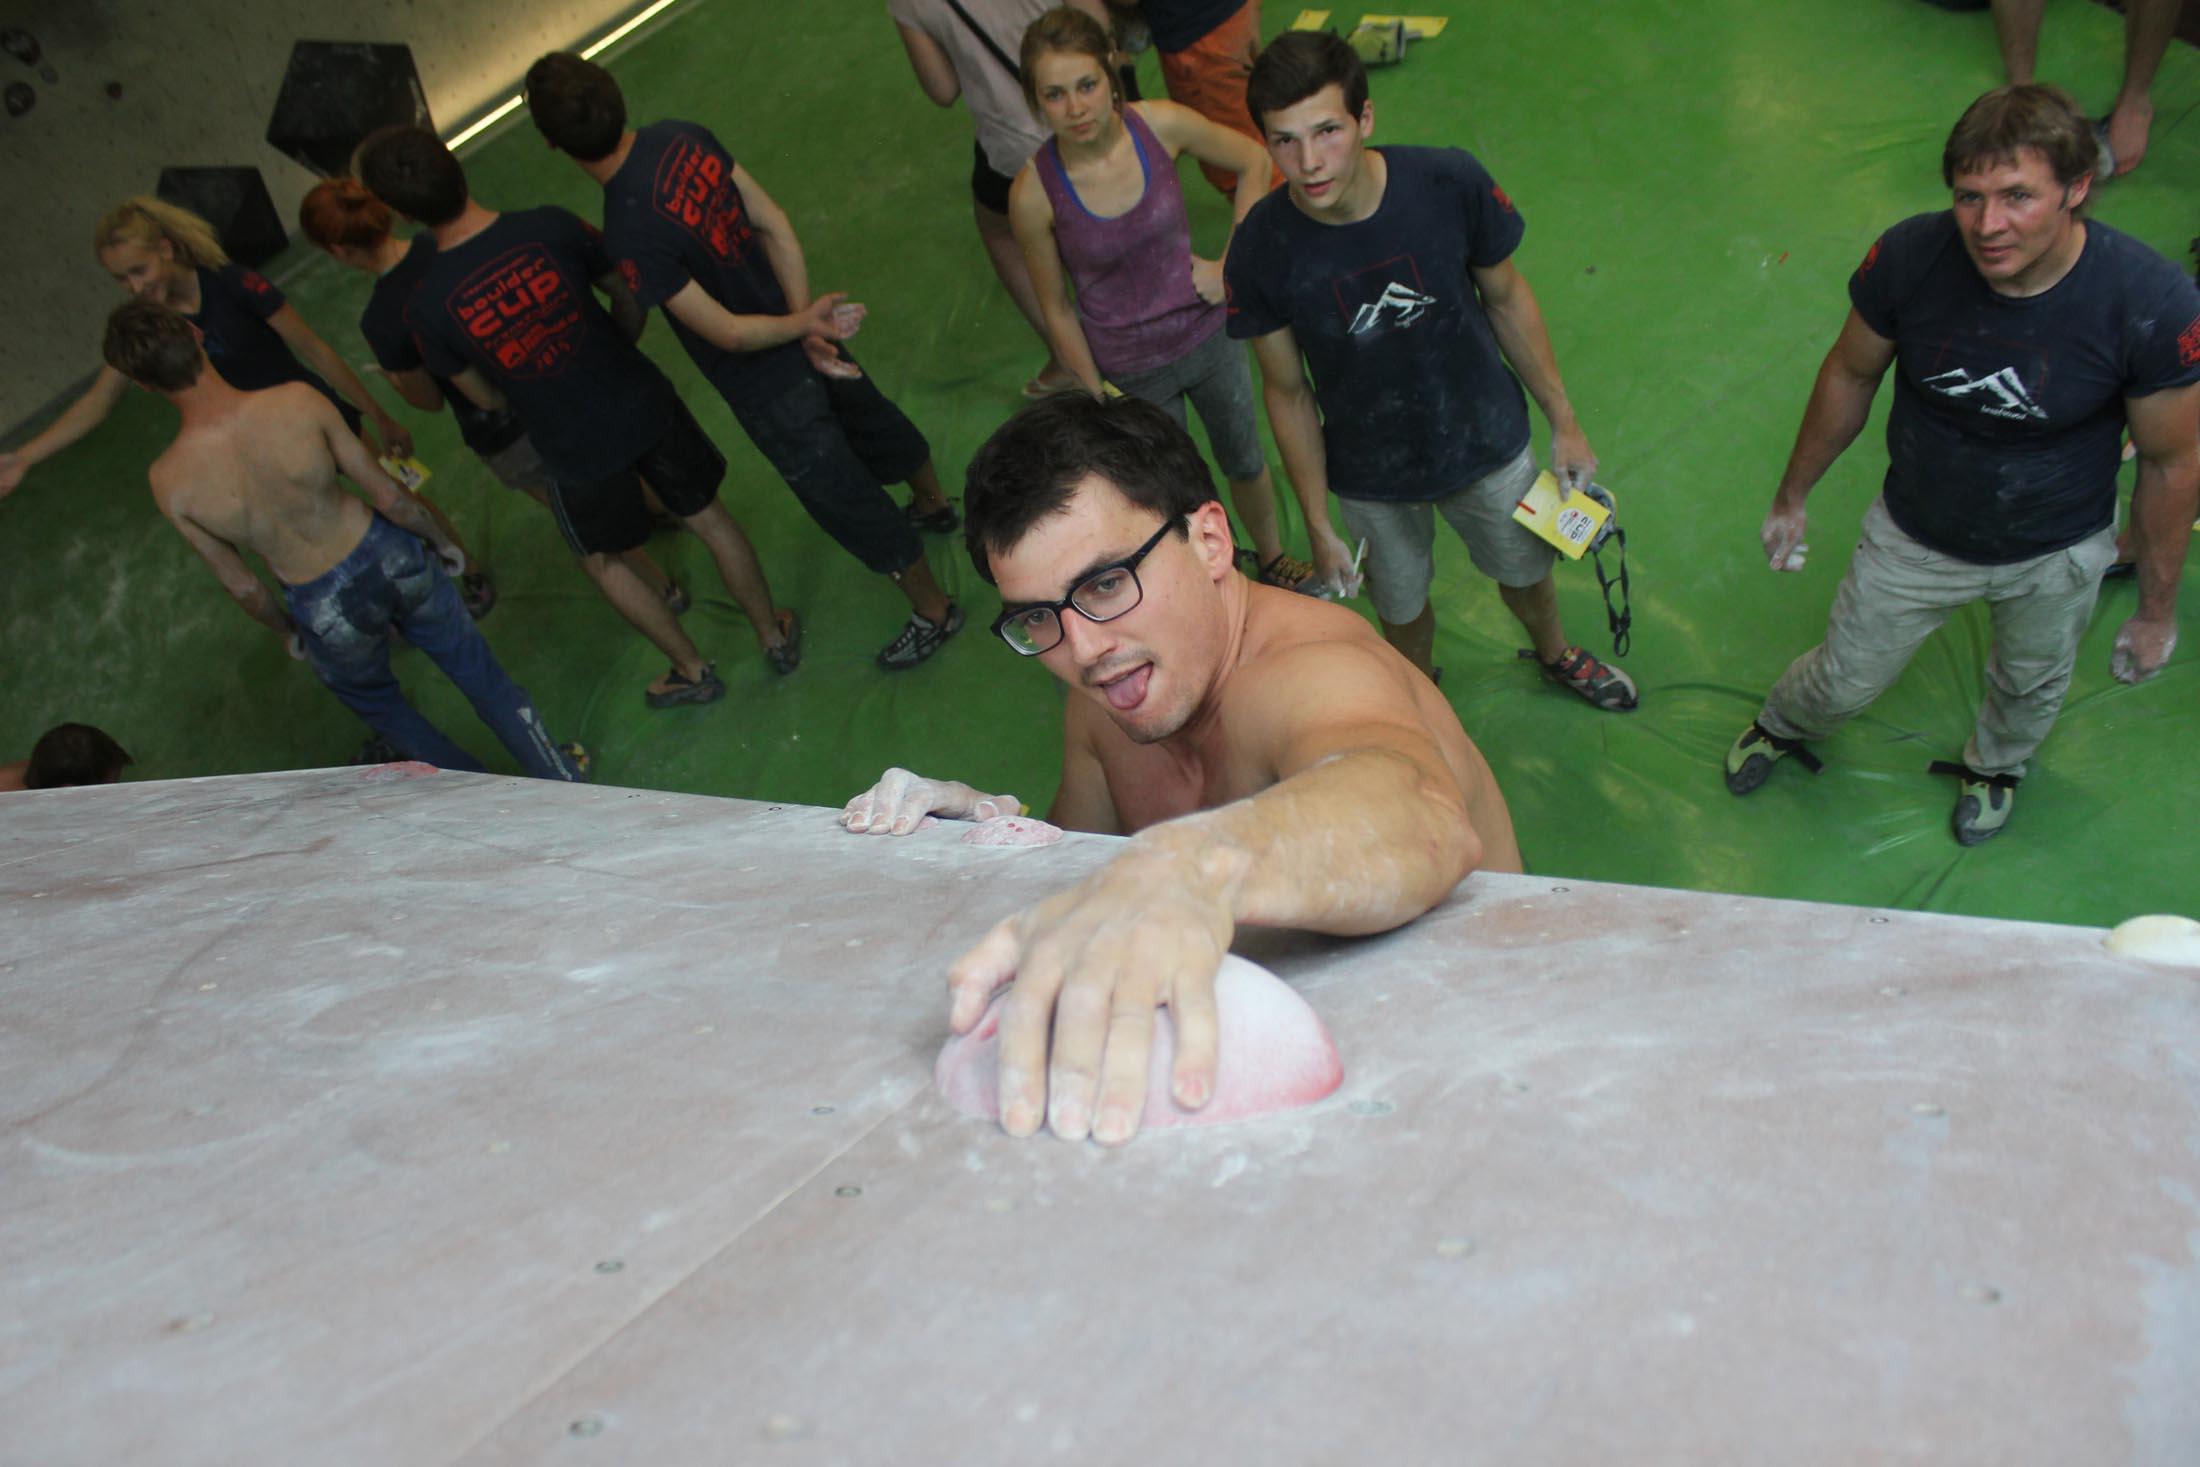 Quali, internationaler bouldercup Frankenjura 2016, BLOCKHELDEN Erlangen, Mammut, Bergfreunde.de, Boulderwettkampf07092016279